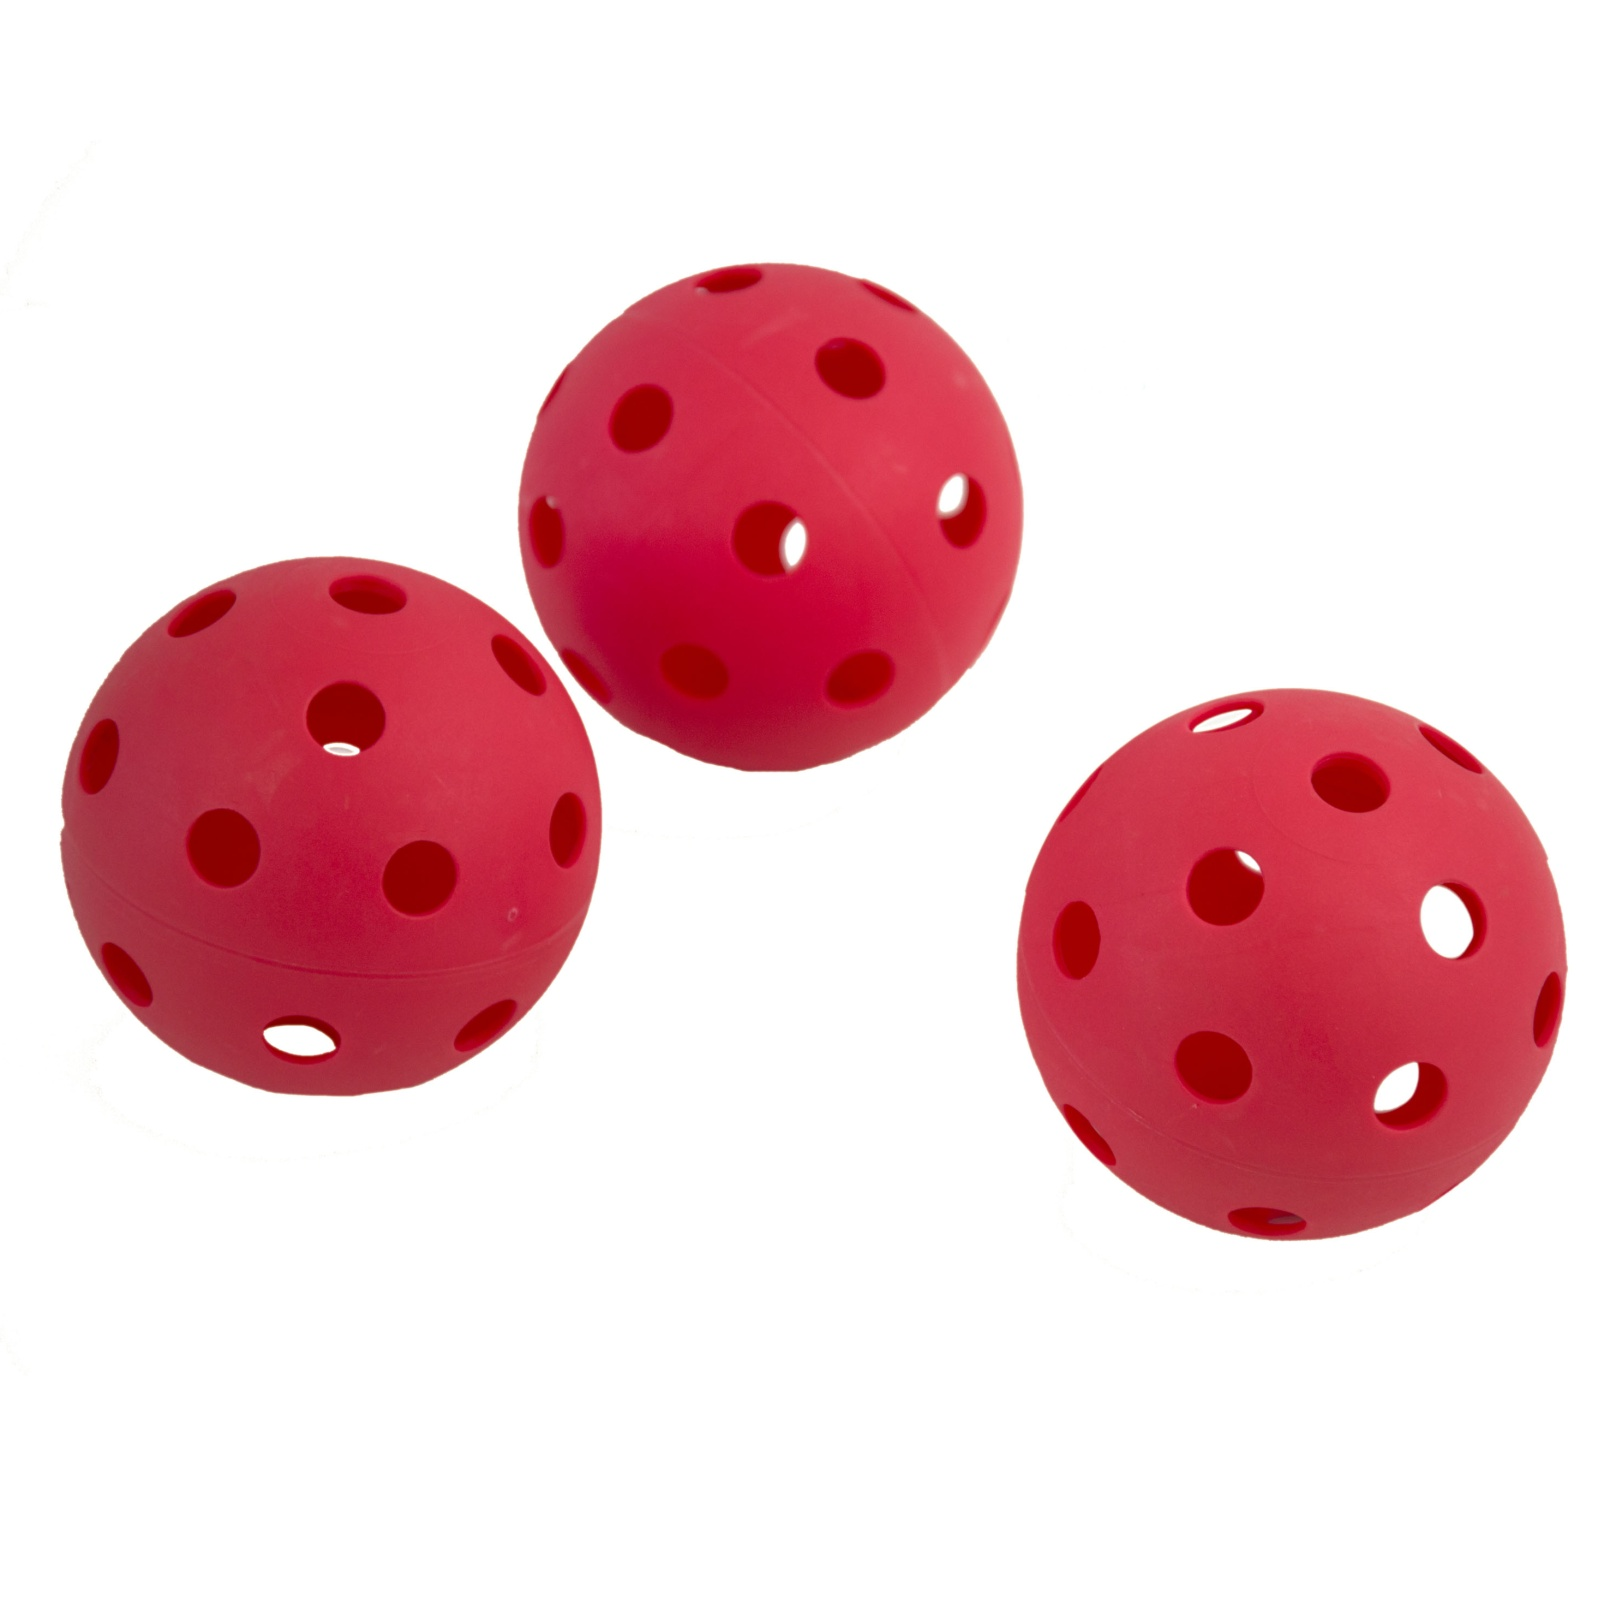 Florbalové míčky SPOKEY Turn - 3ks, červené